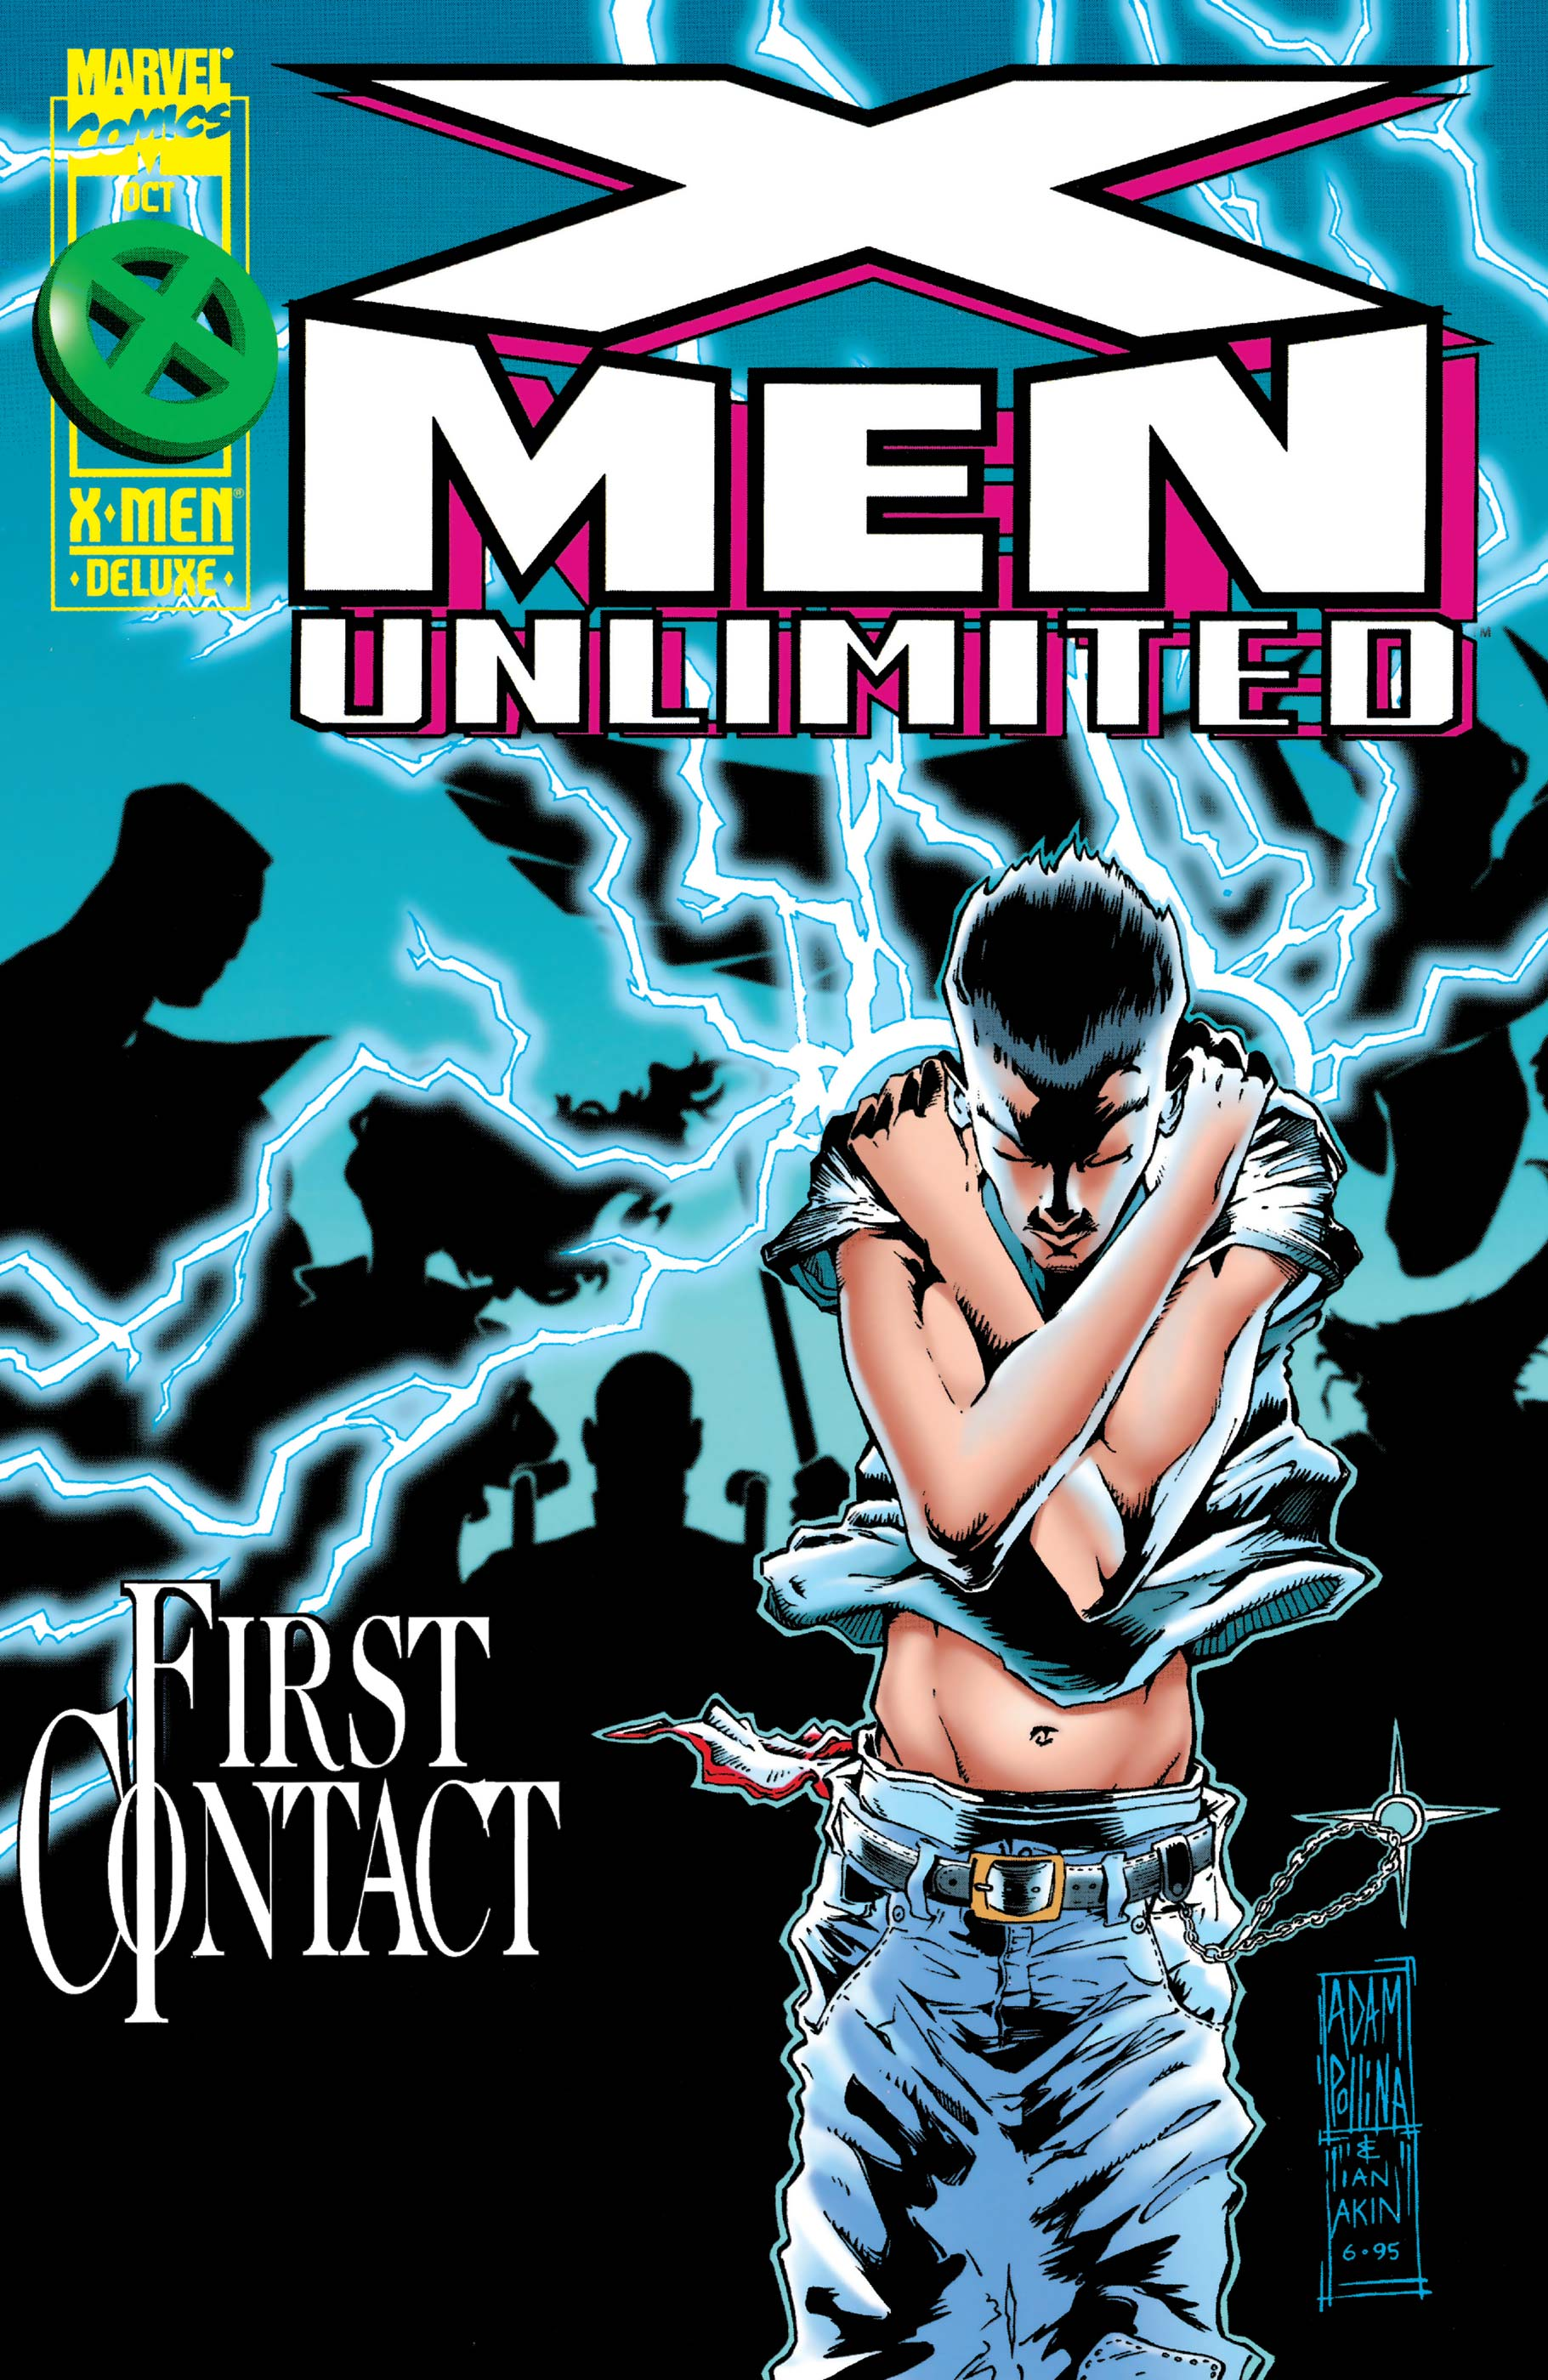 X-Men Unlimited (1993) #8